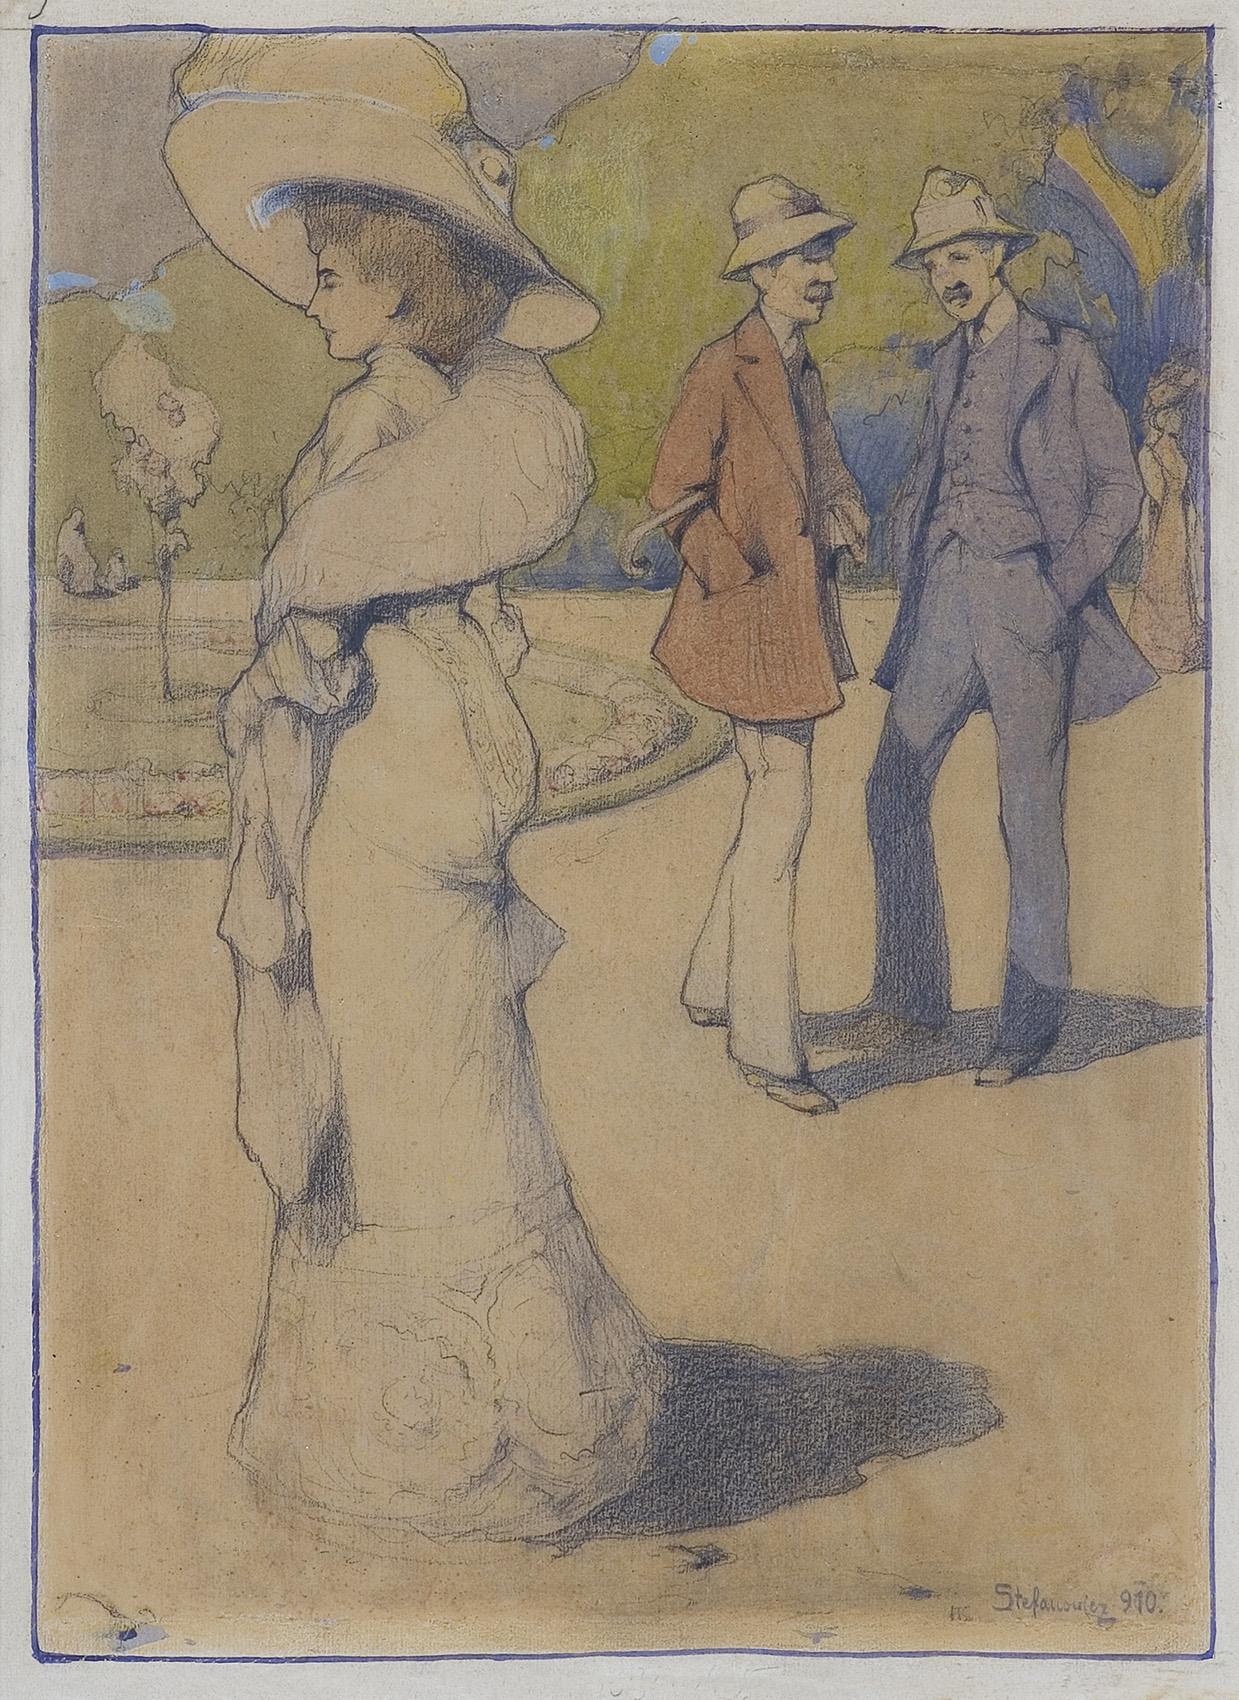 W PARKU, 1910